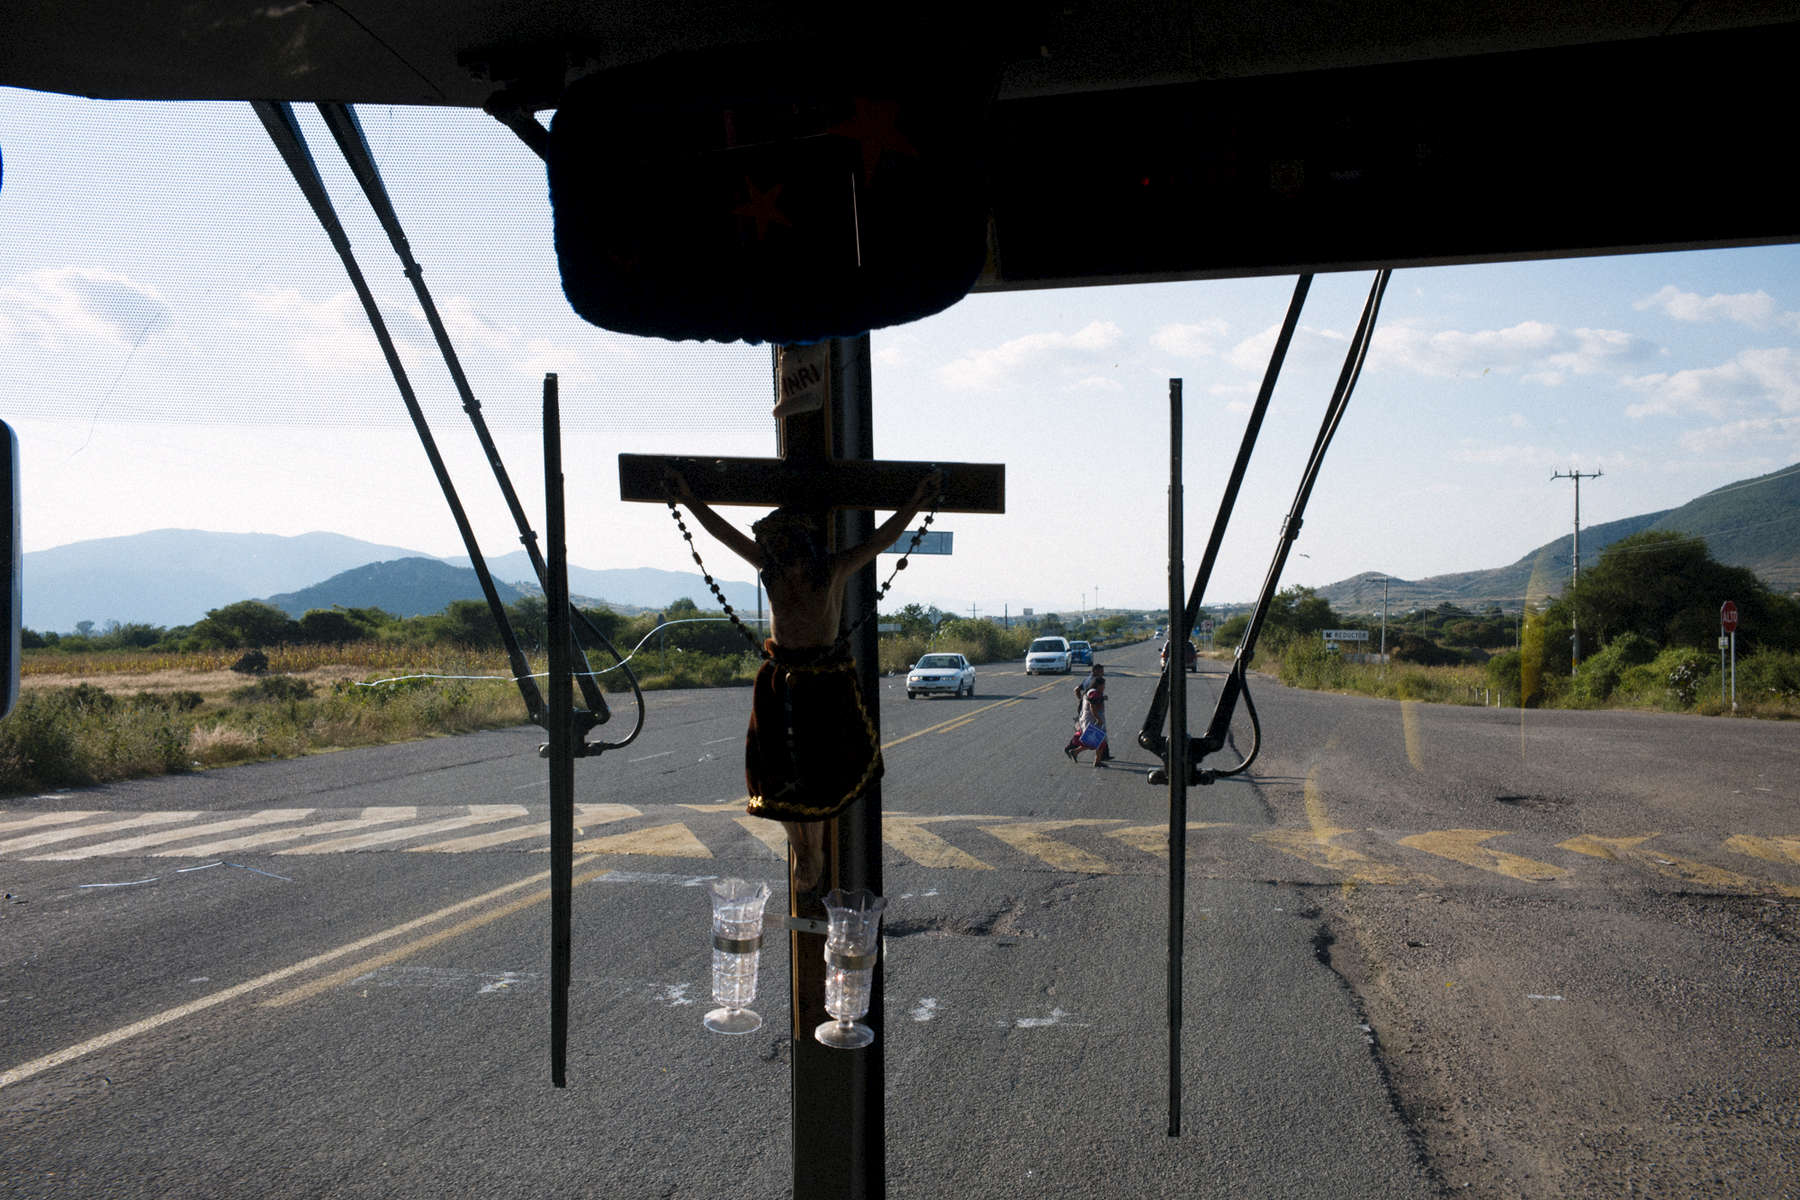 Mexico-bus-M1004115